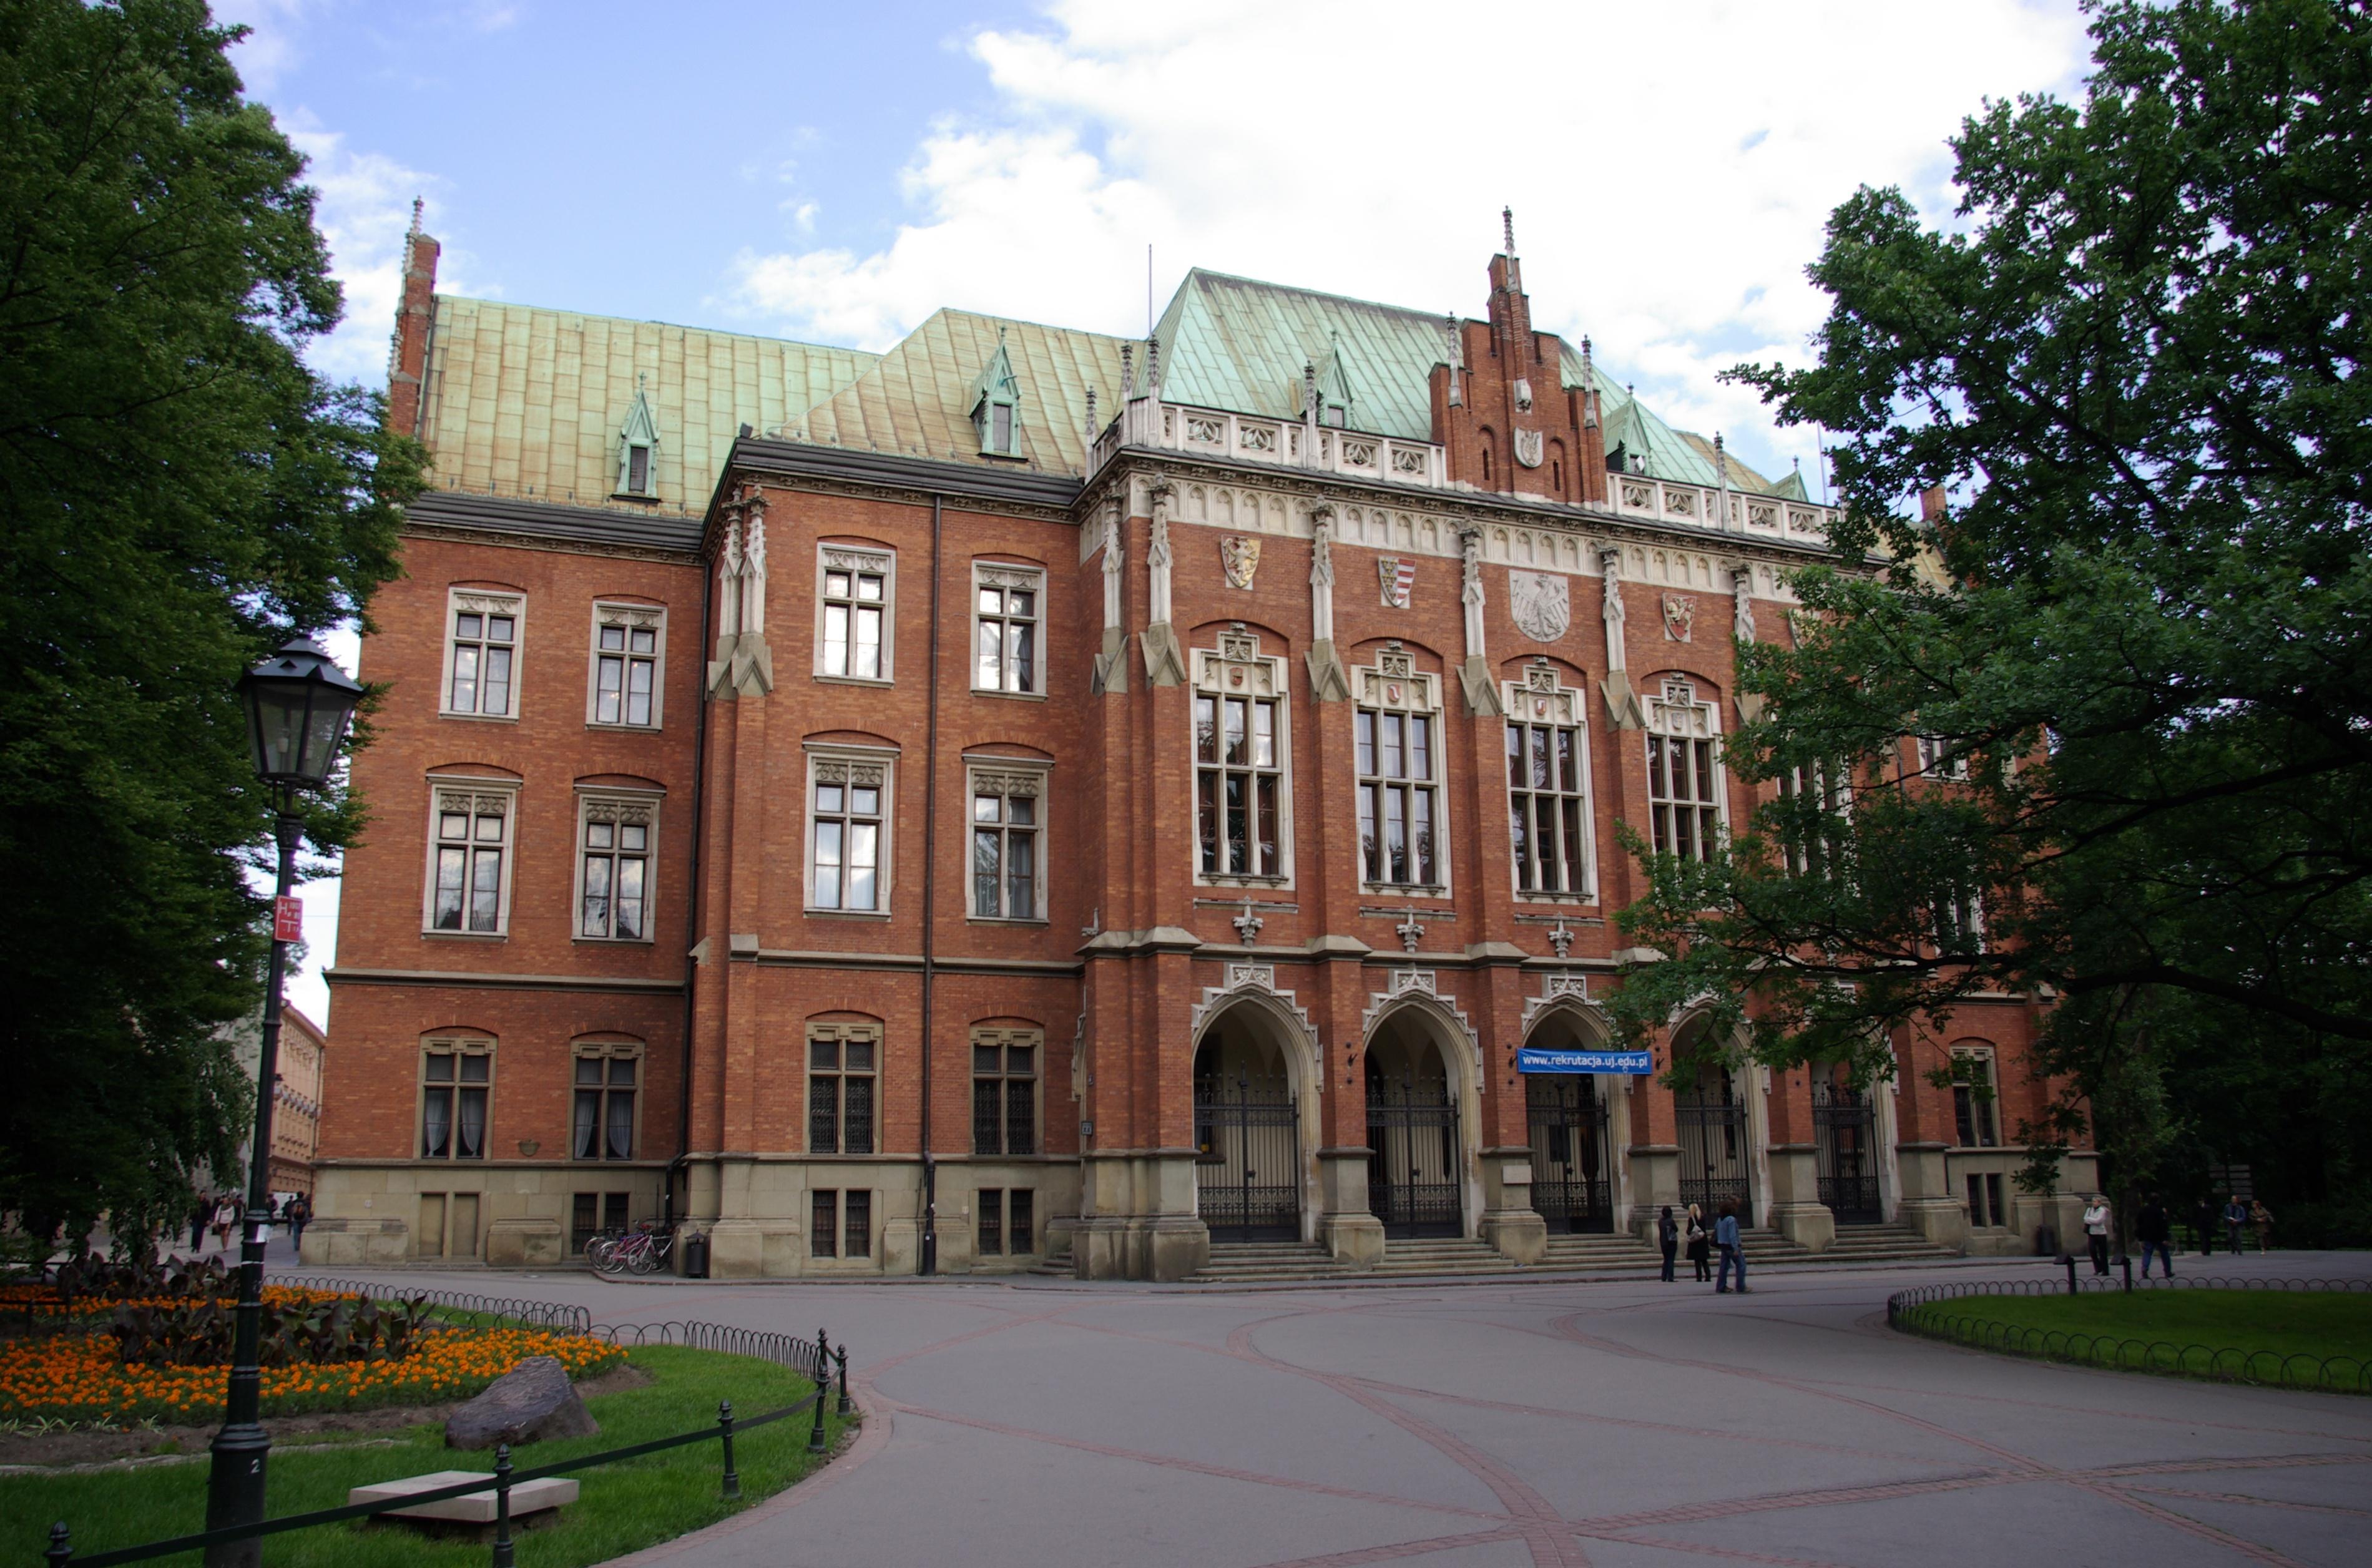 File:Collegium Novum Kraków 001.JPG - Wikimedia Commons